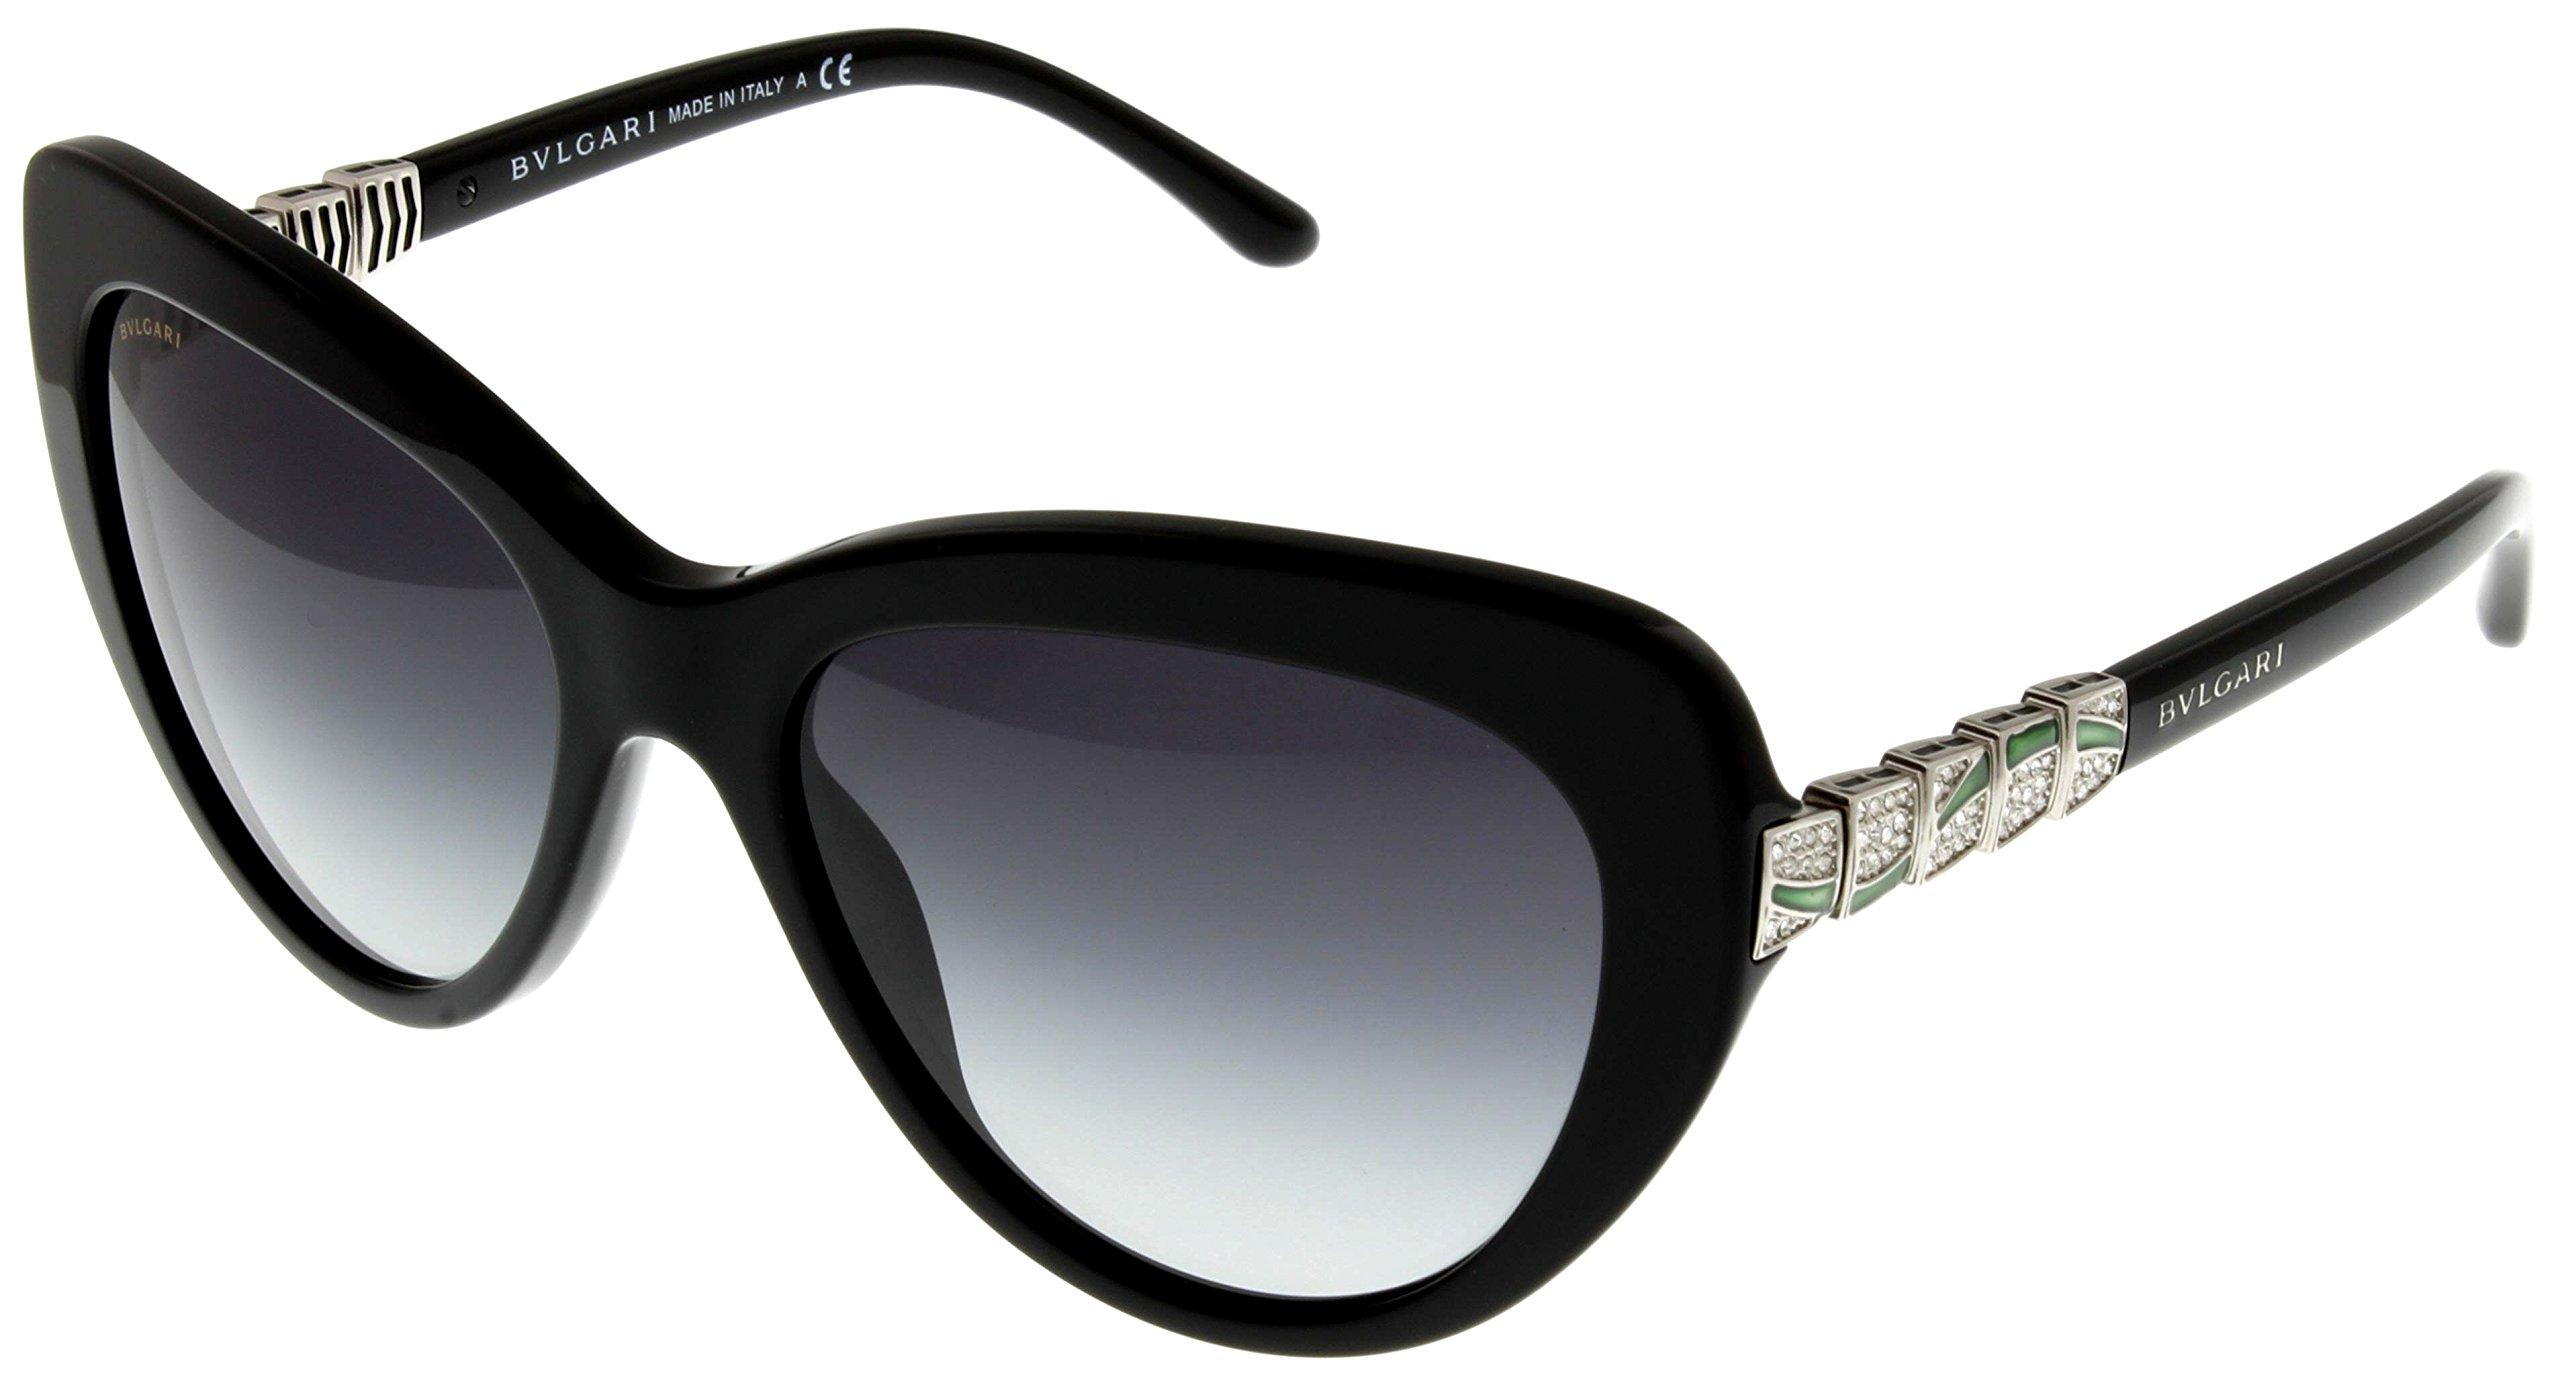 Bvlgari Sunglasses Womens Black Butterfly BV8143B 501/8G